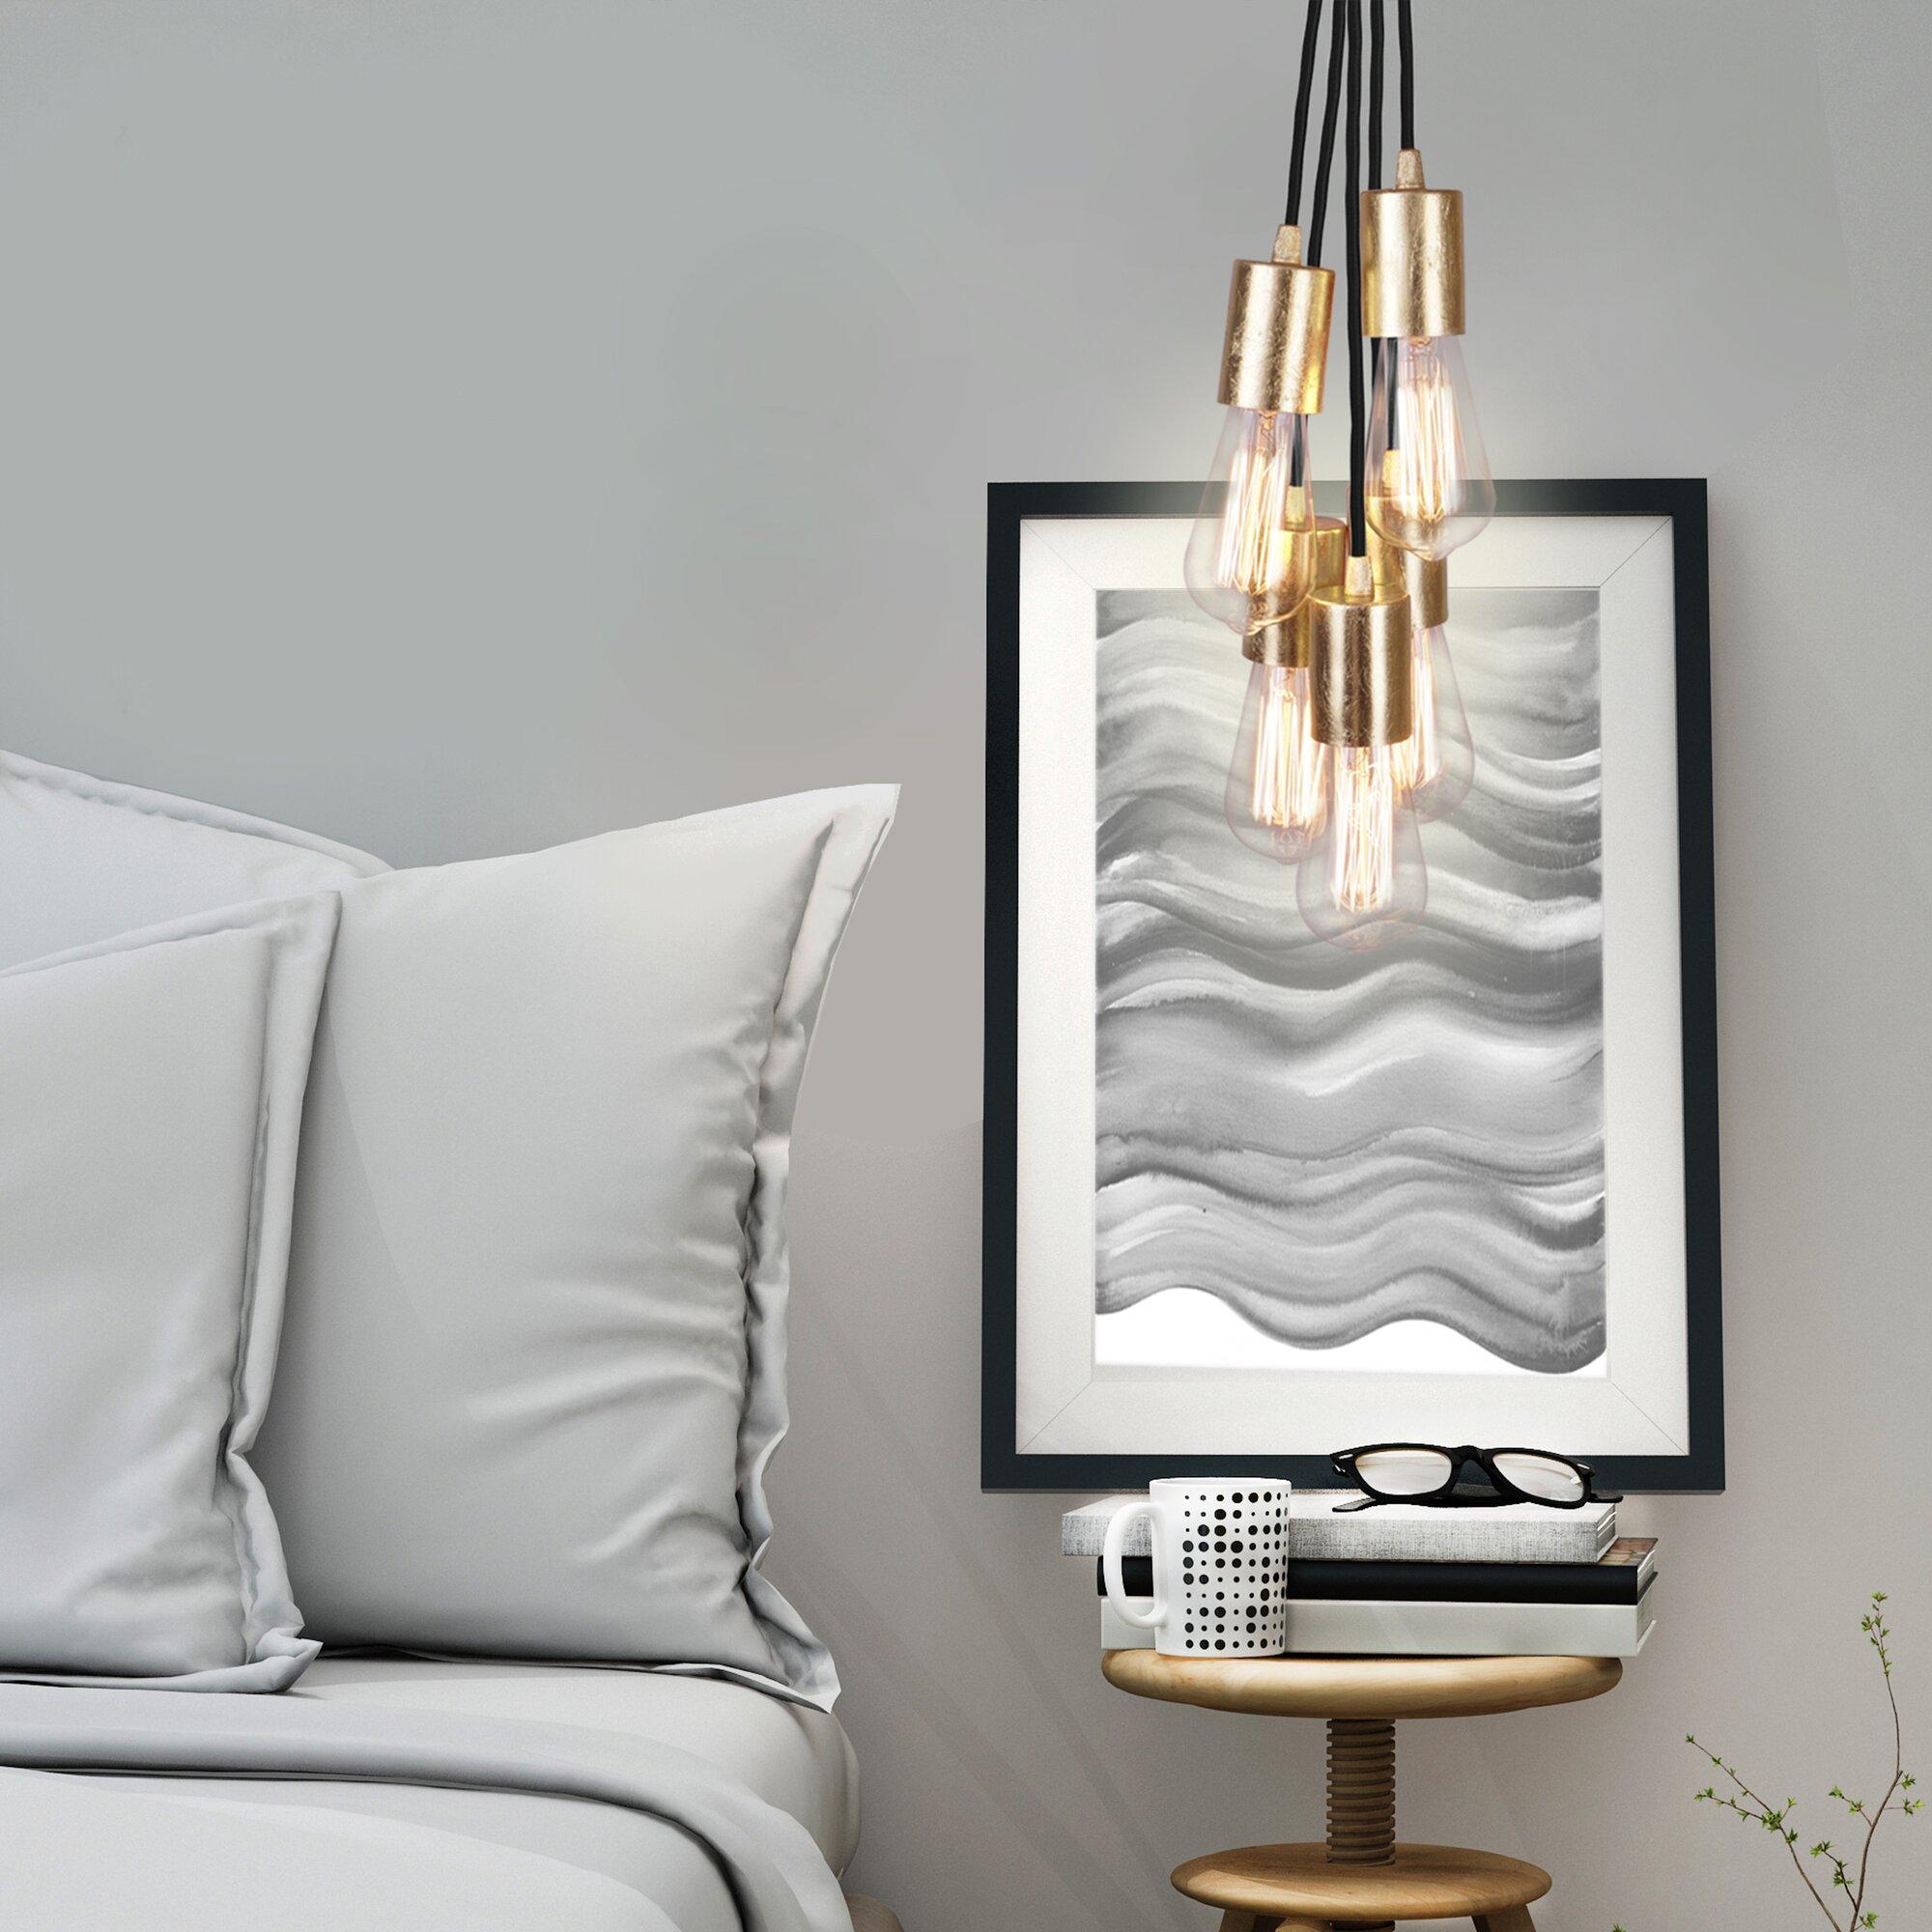 modernmoments kaskaden pendelleuchte 5 flammig cero bewertungen. Black Bedroom Furniture Sets. Home Design Ideas